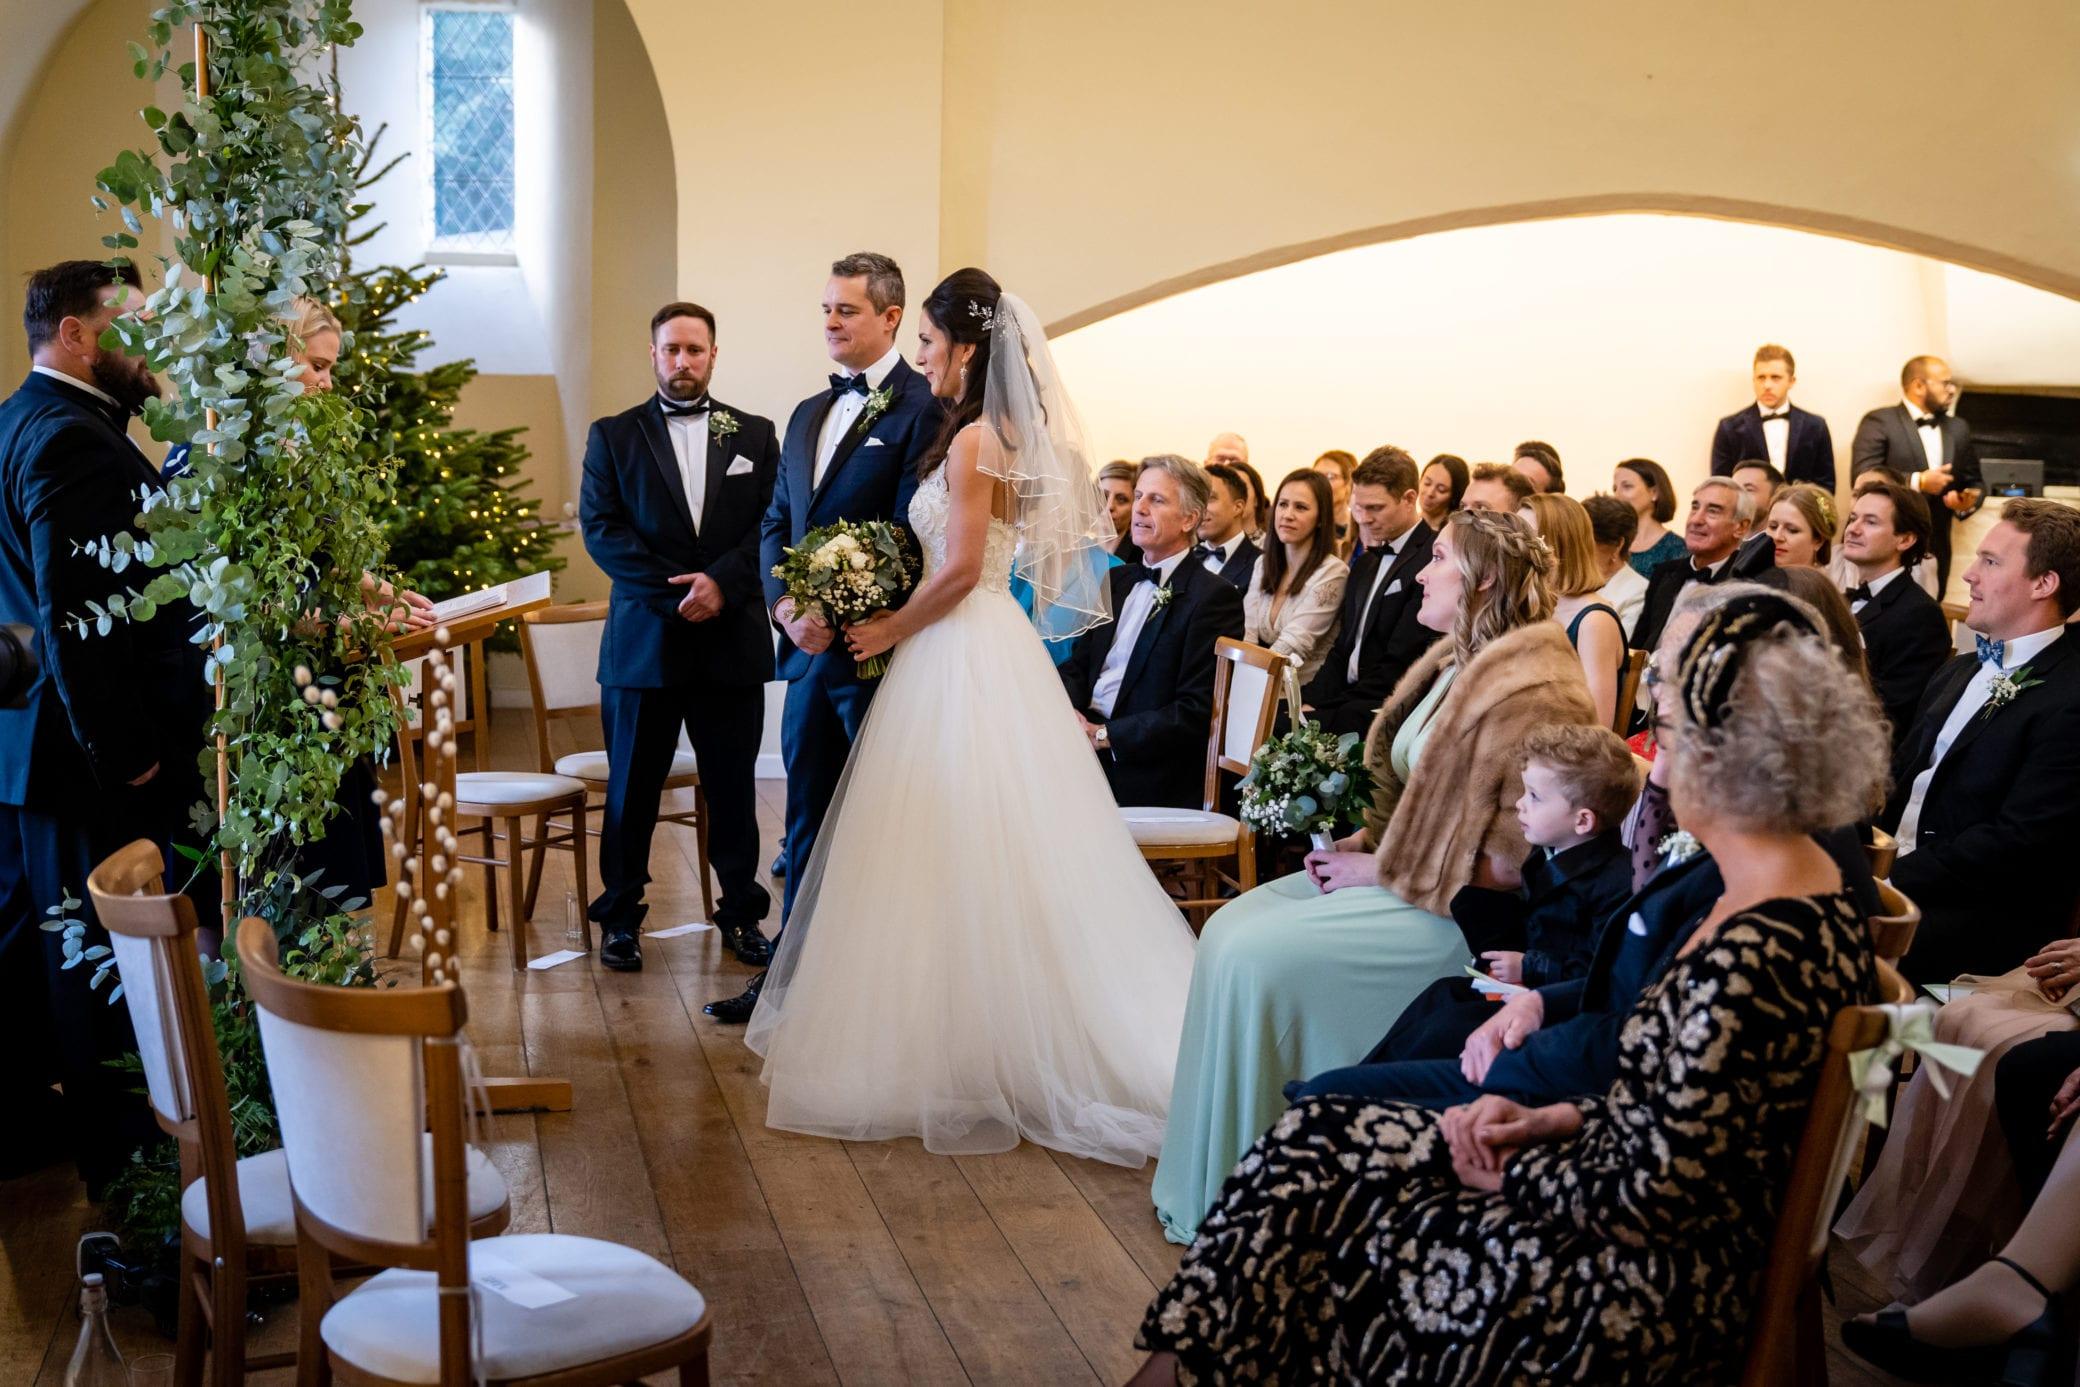 Wedding ceremony room at Farnham Castle near London